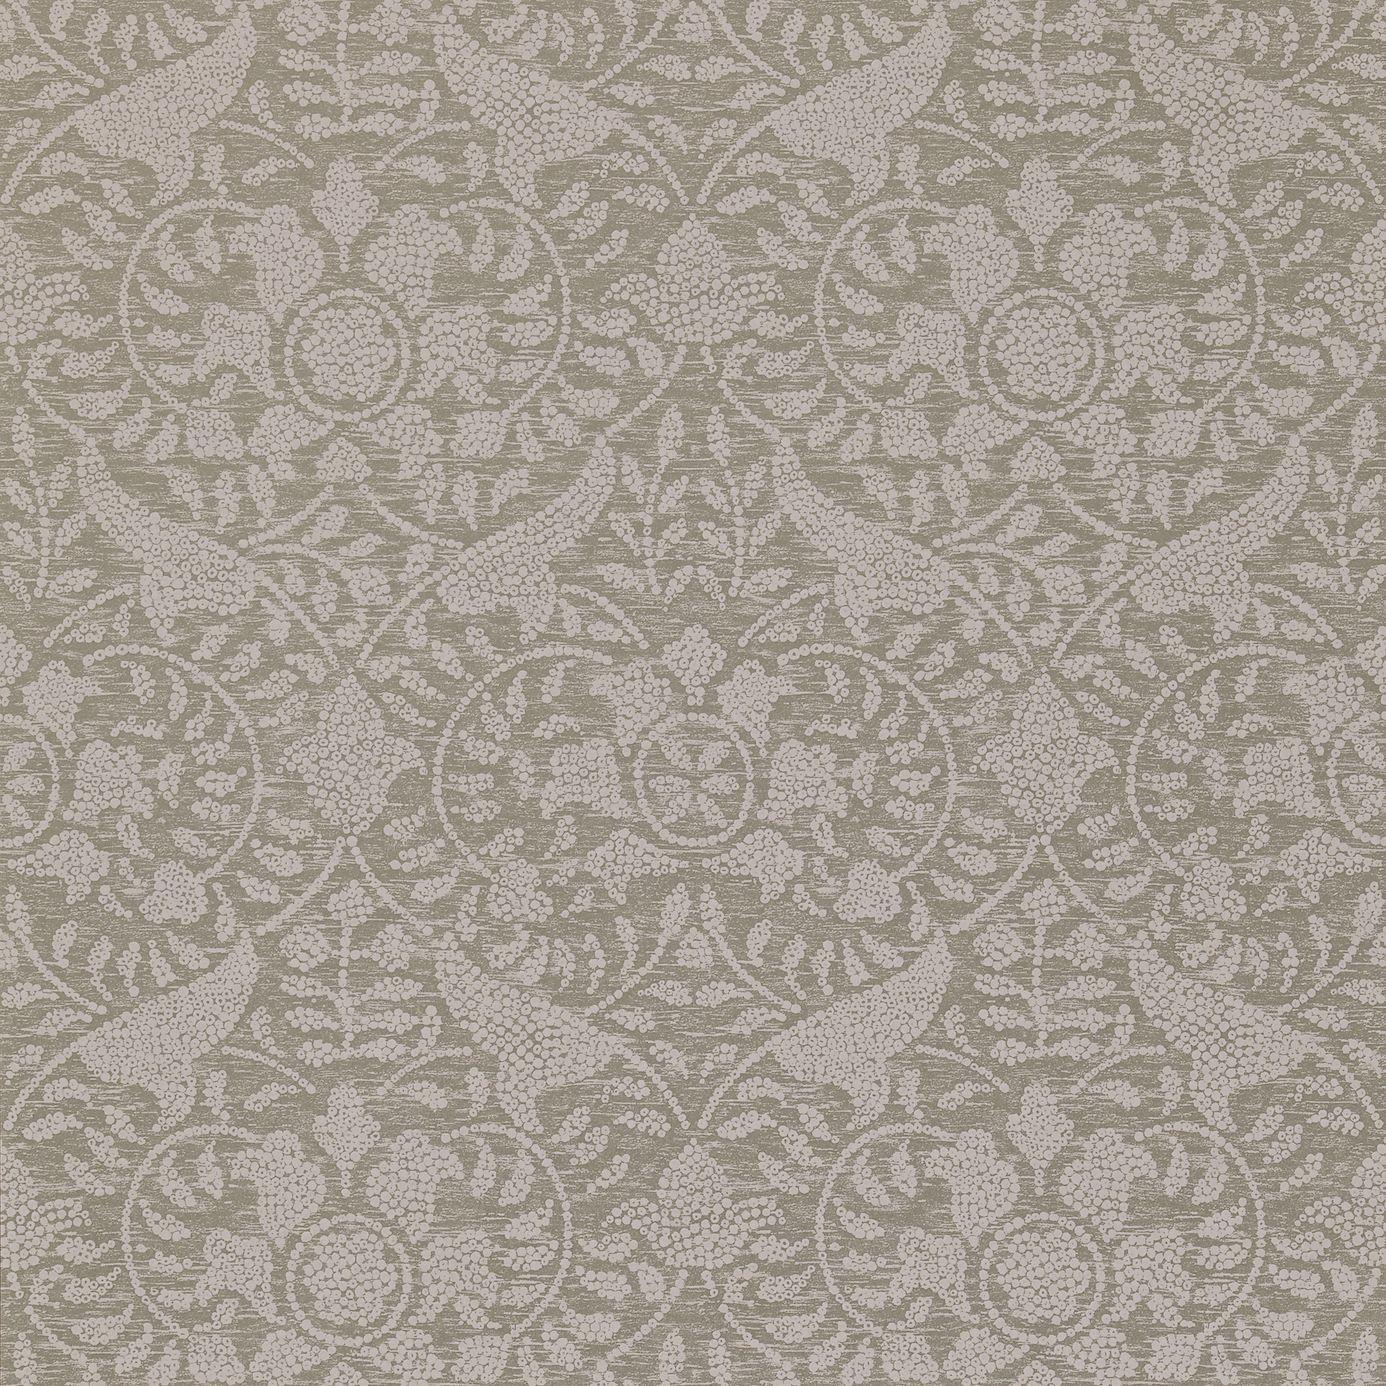 ... Harlequin Lalika Wallpapers Azita Wallpaper - Silver/Pale Lilac